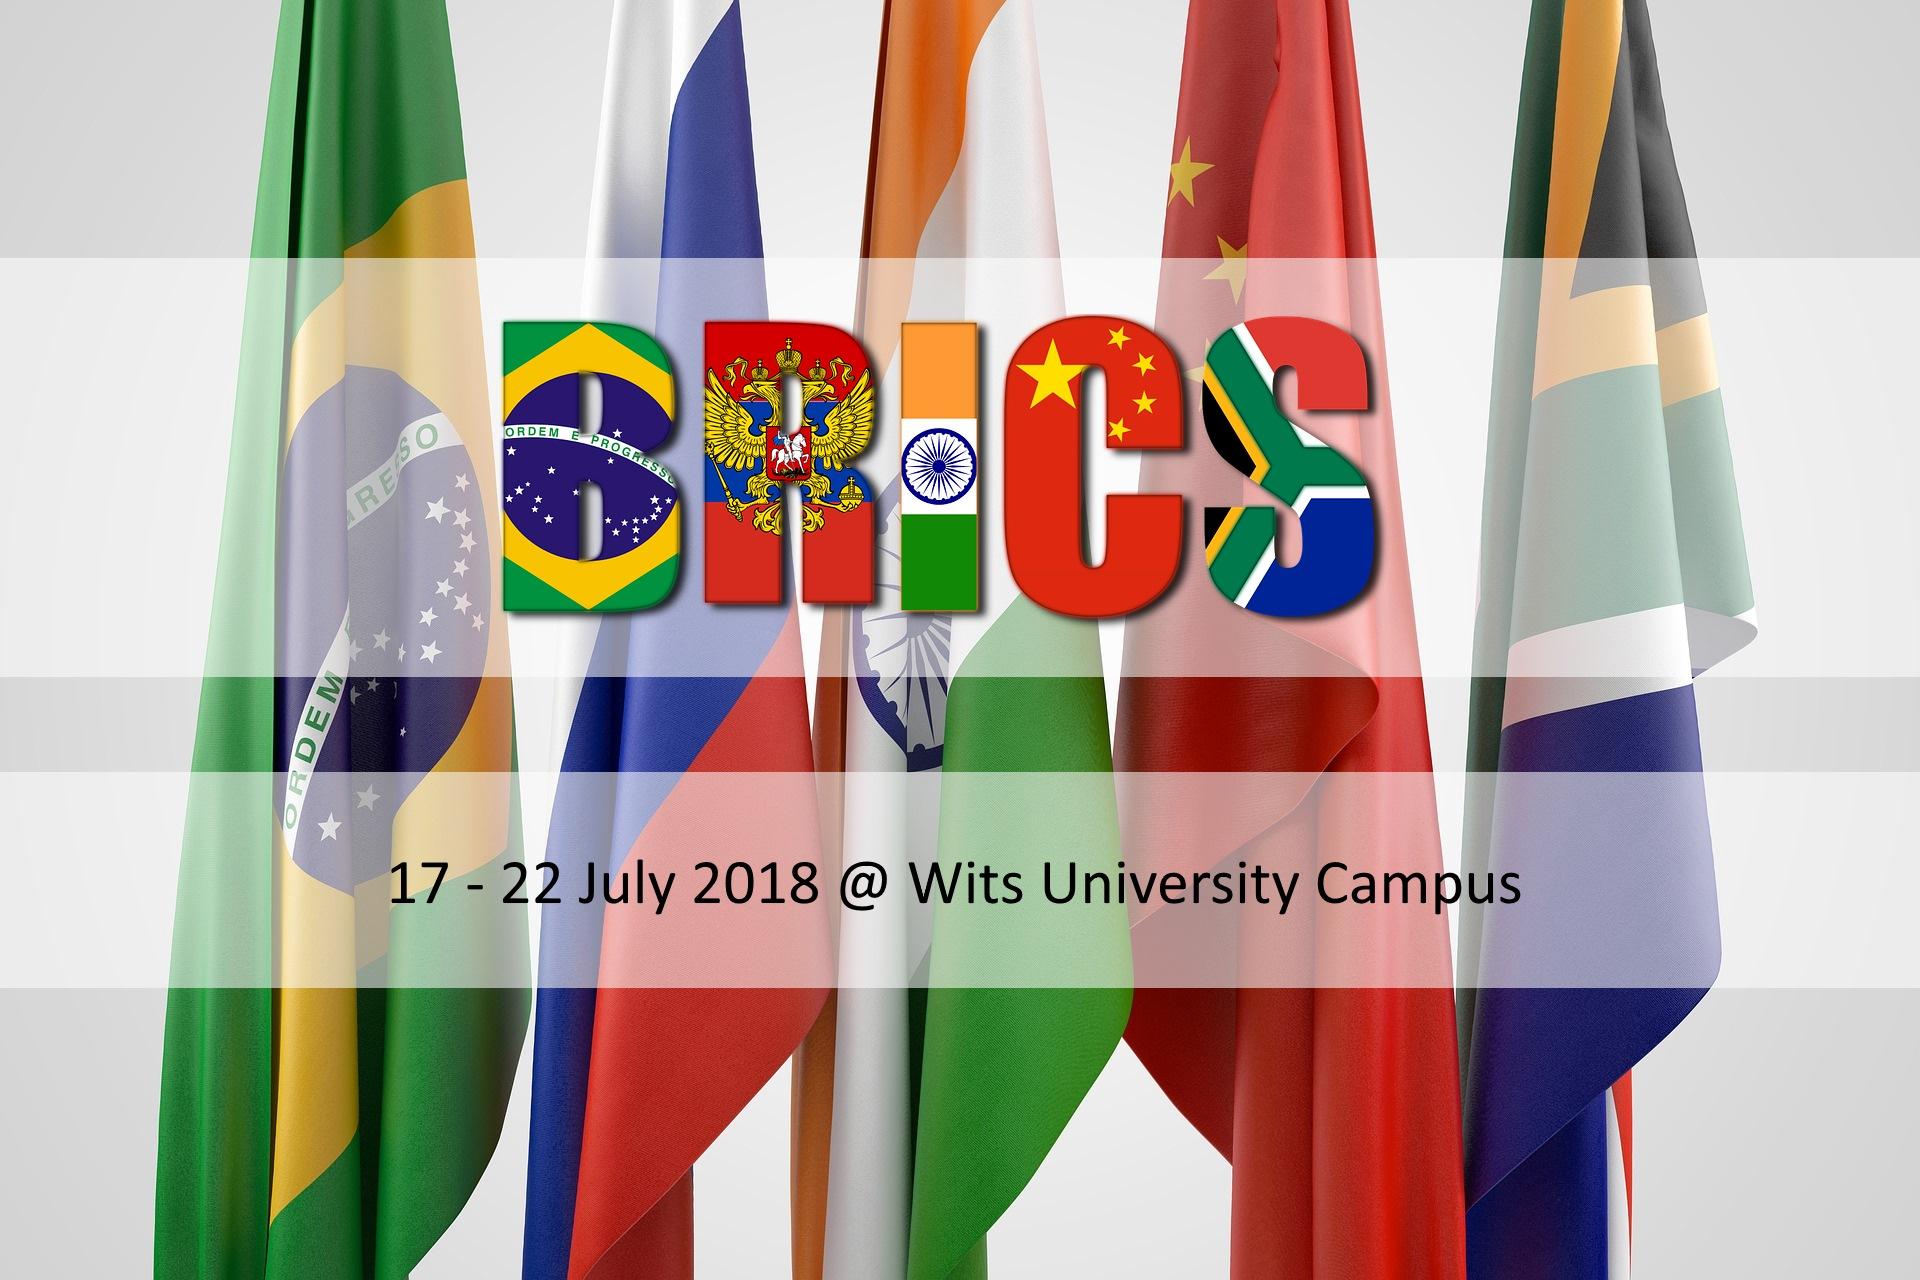 BRICS 2018 South Africa